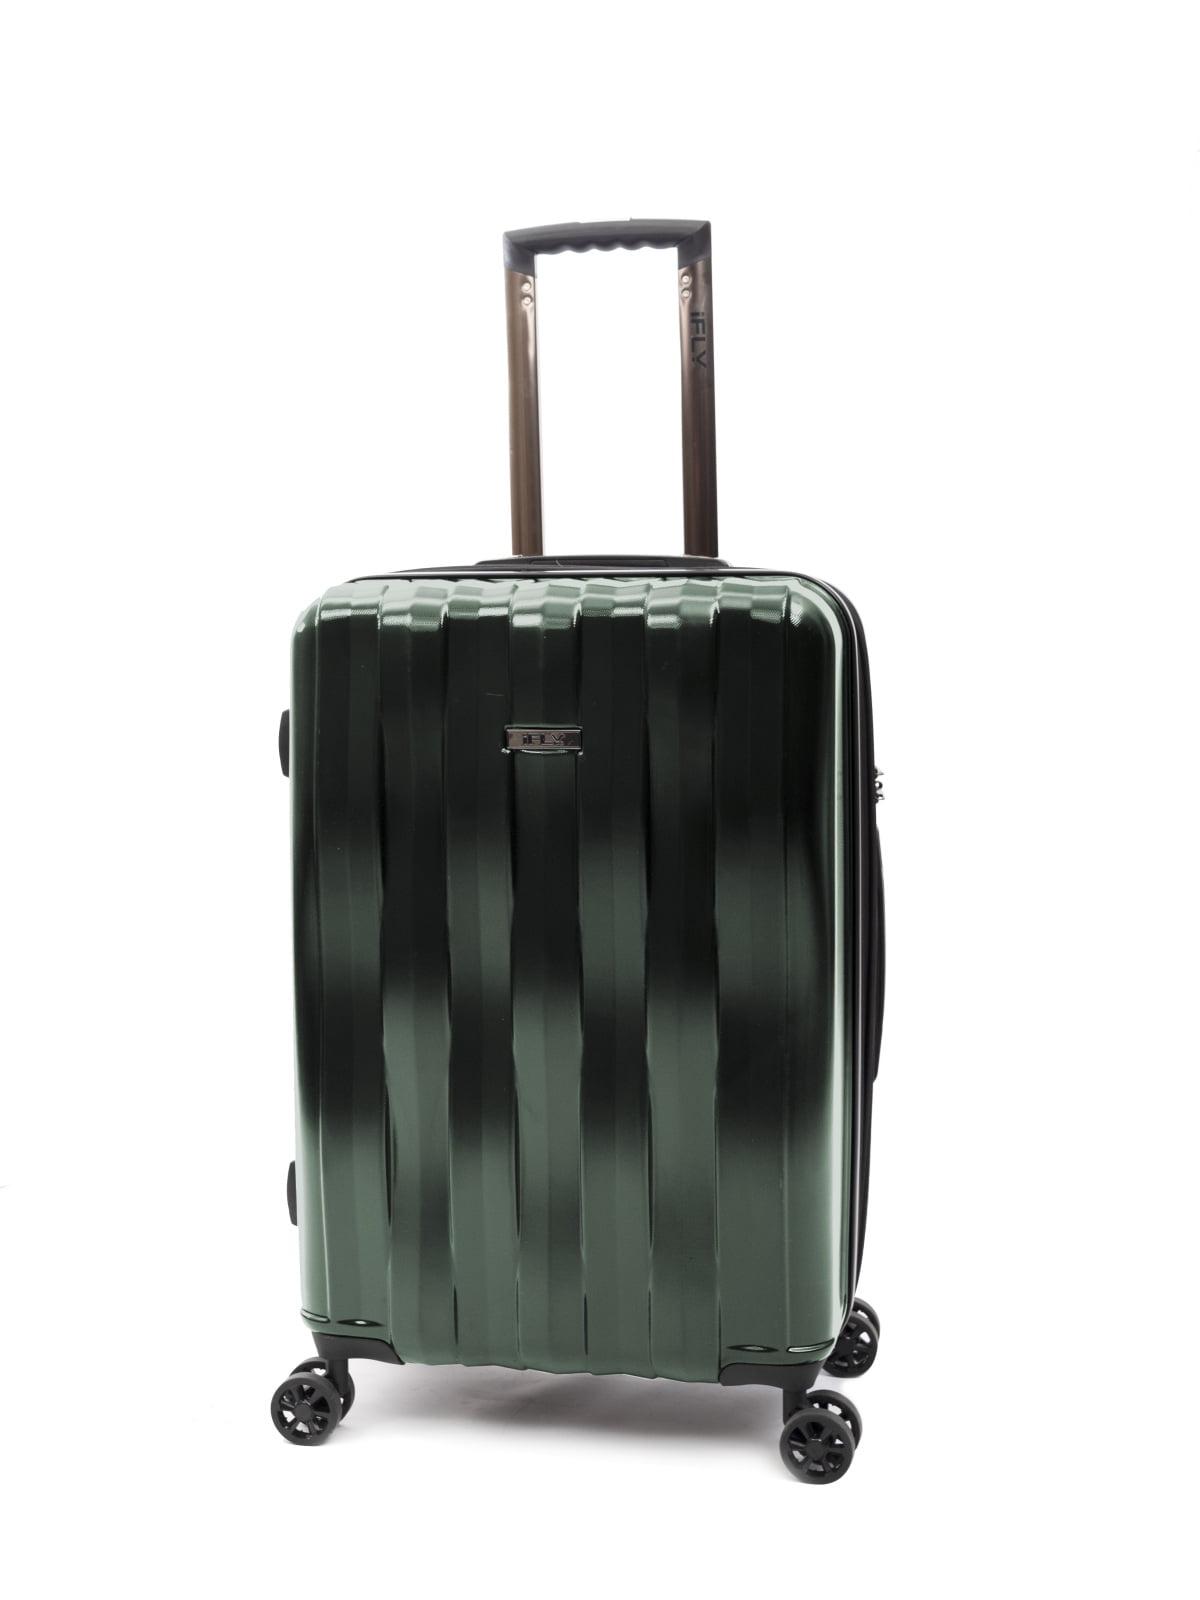 "iFLY Hardside Luggage Synergy 24"", Green"